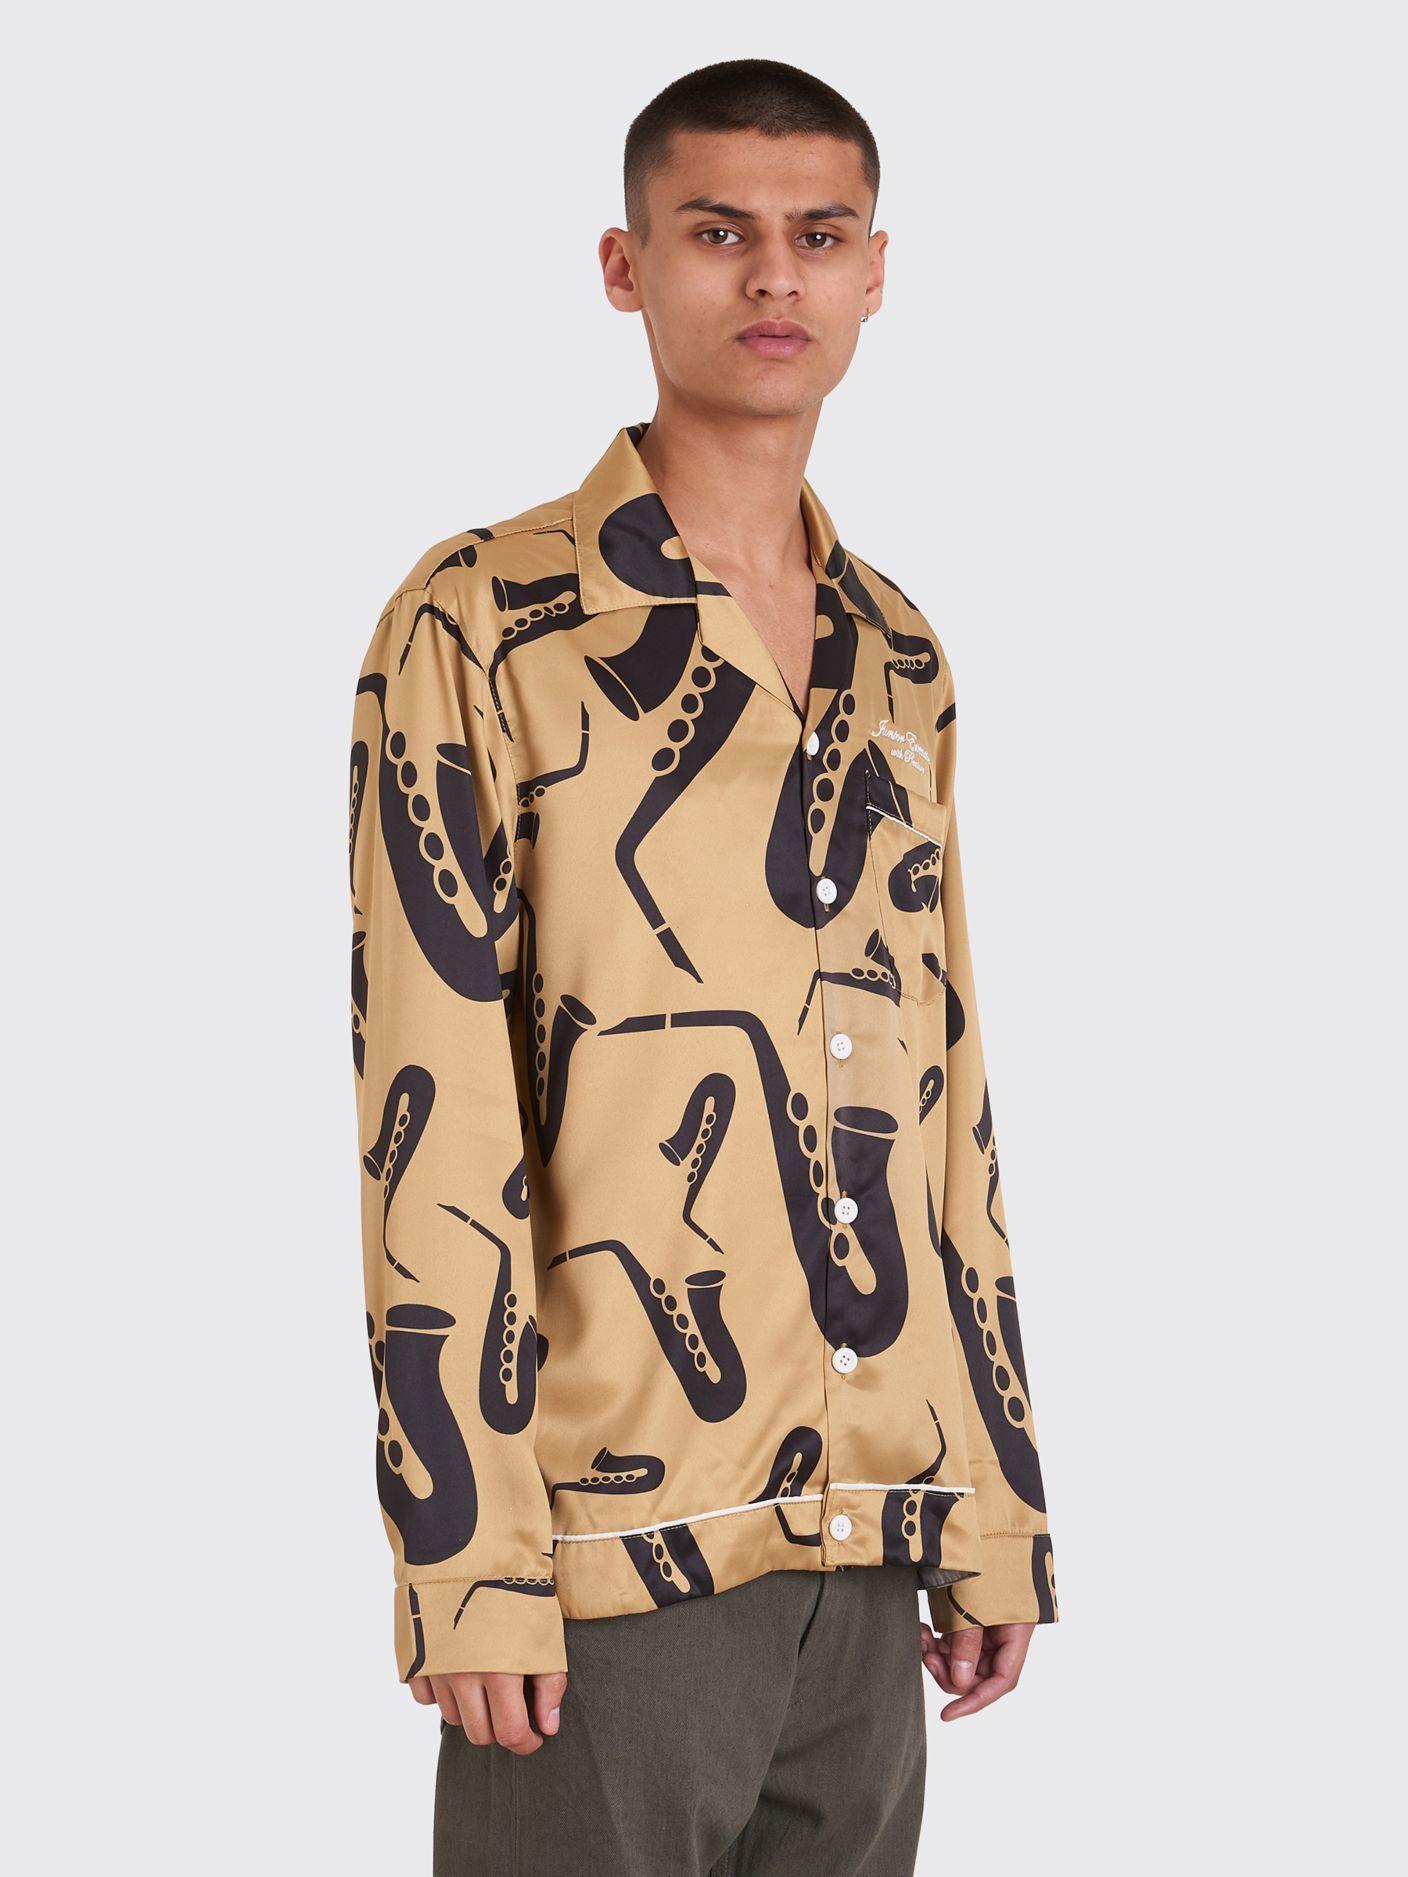 0acfe6f5b Junior Executive With Pleasure Saxophone Shirt Gold   Shirts ...